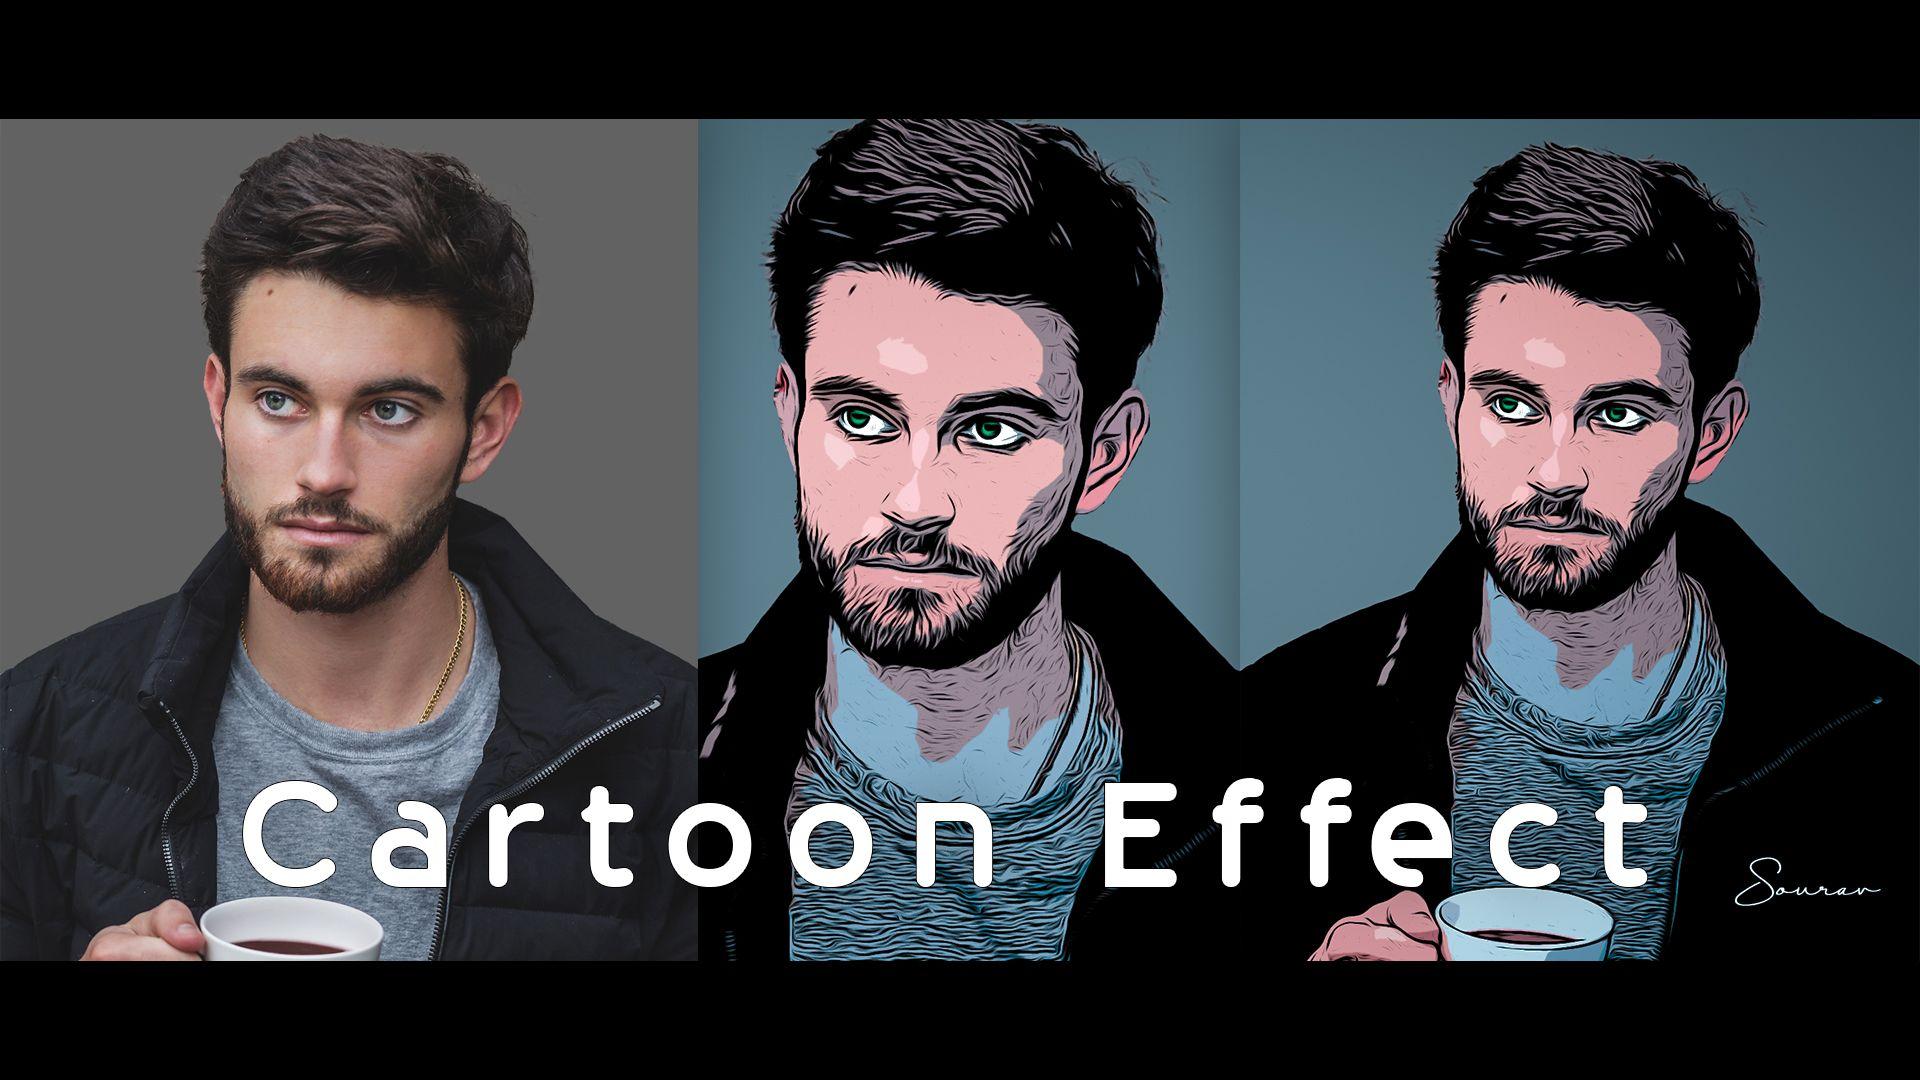 Cartoon Effect In Photoshop Cc 2019 Photoshop Tutorials Photoshop Tutorial Photoshop Editing Tutorials Photoshop